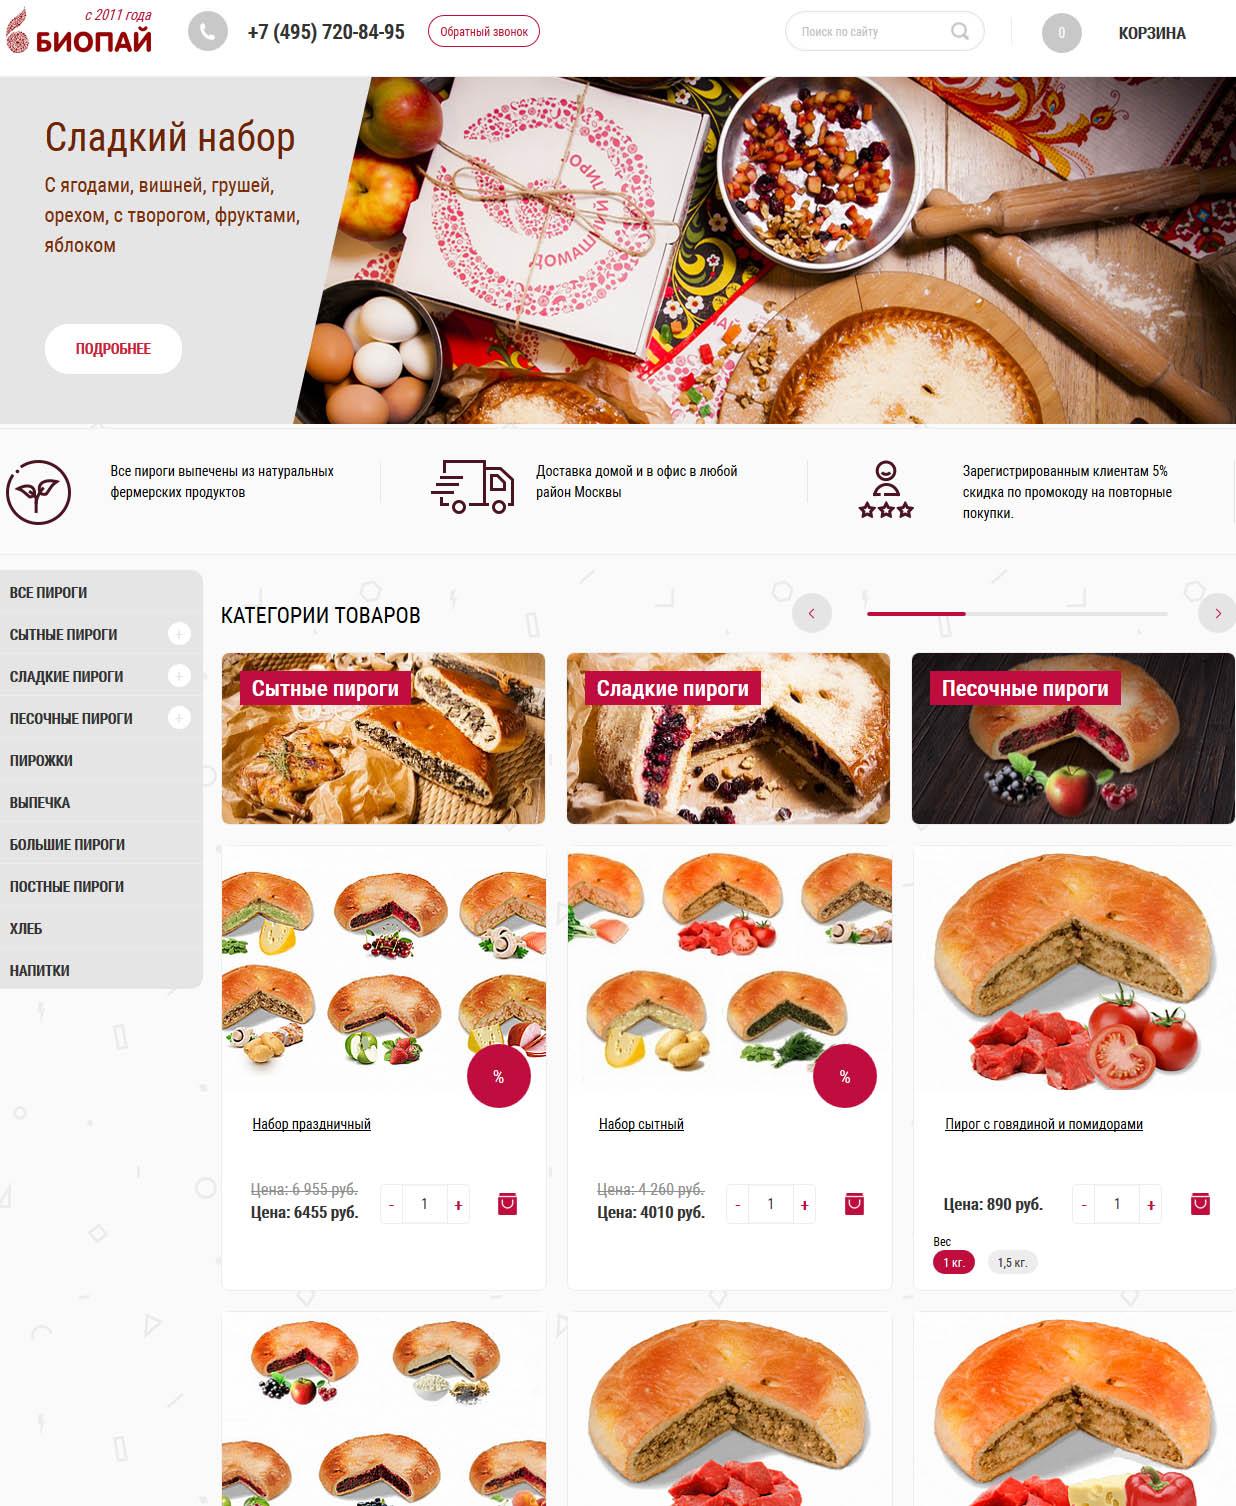 Интернет-магазин пекарни Биопай